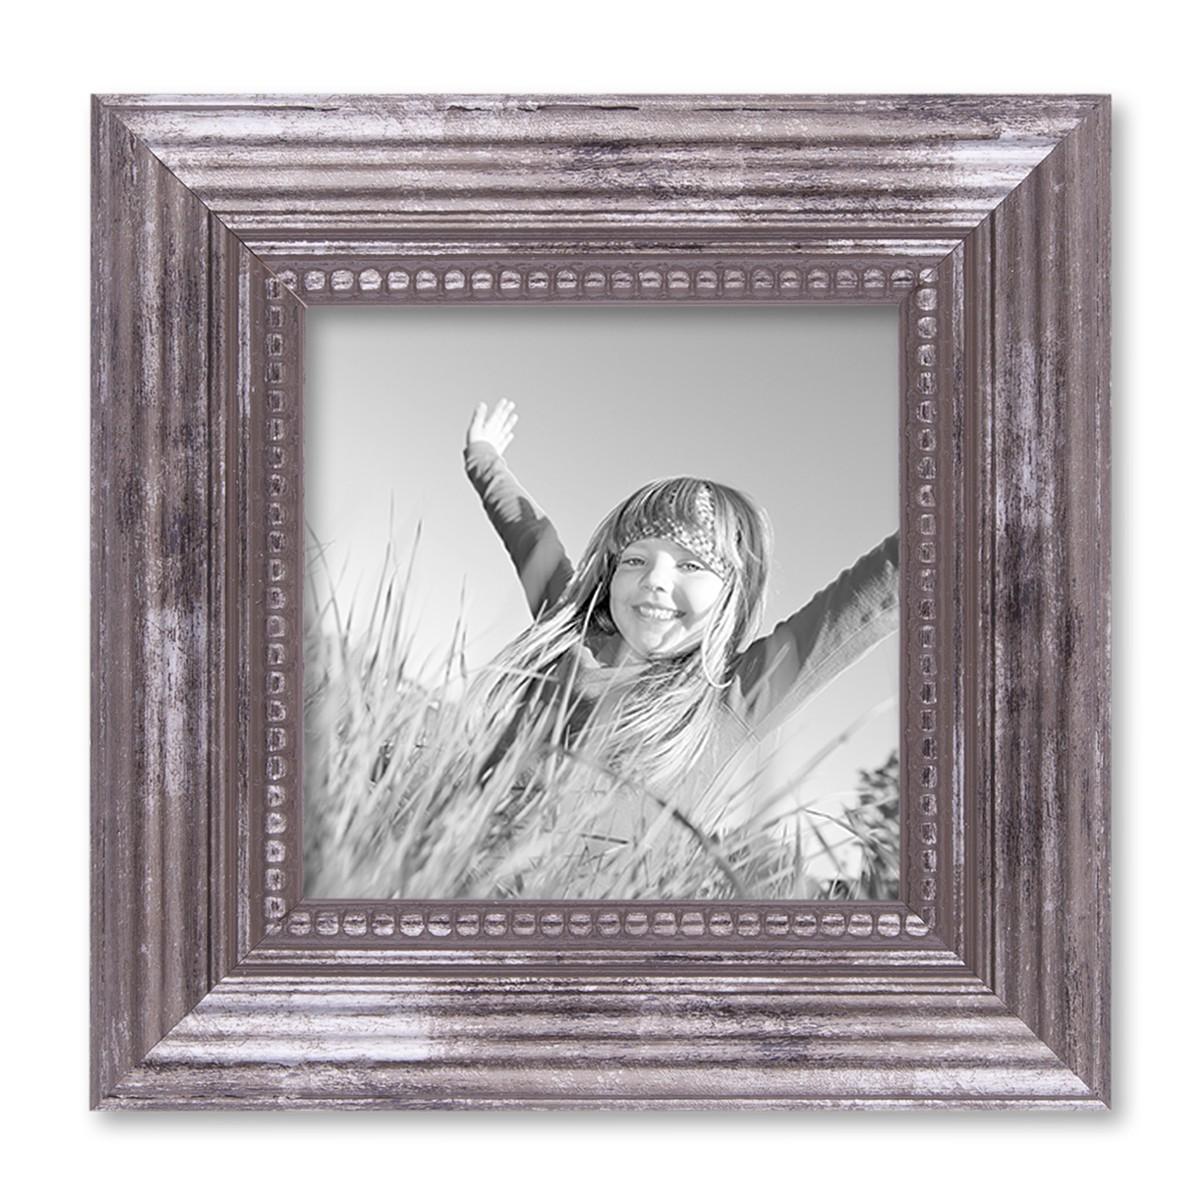 6er-set bilderrahmen silber barock antik 15x20, 20x20 und 20x30 cm